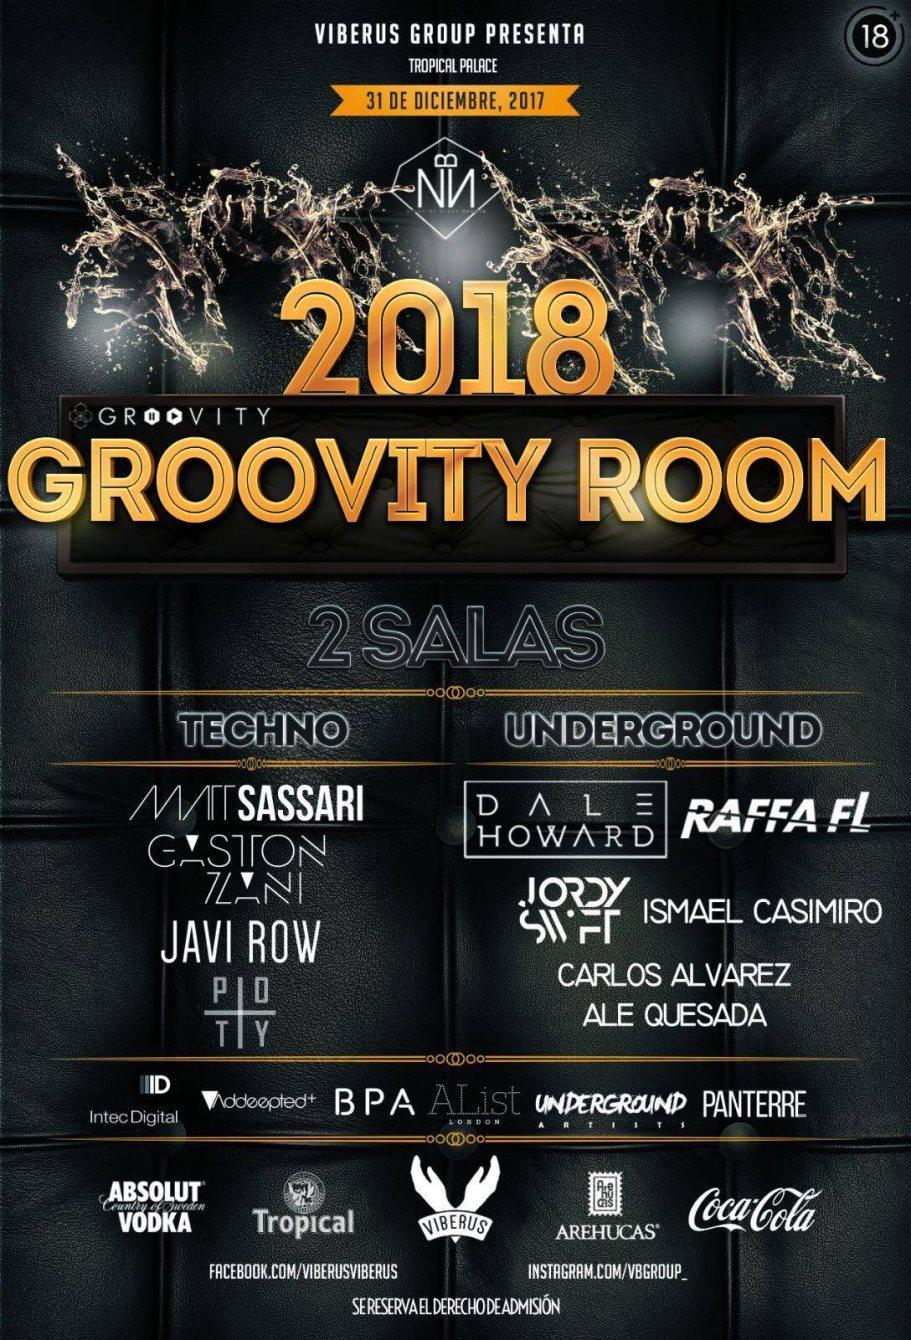 Groovity Room - Flyer front